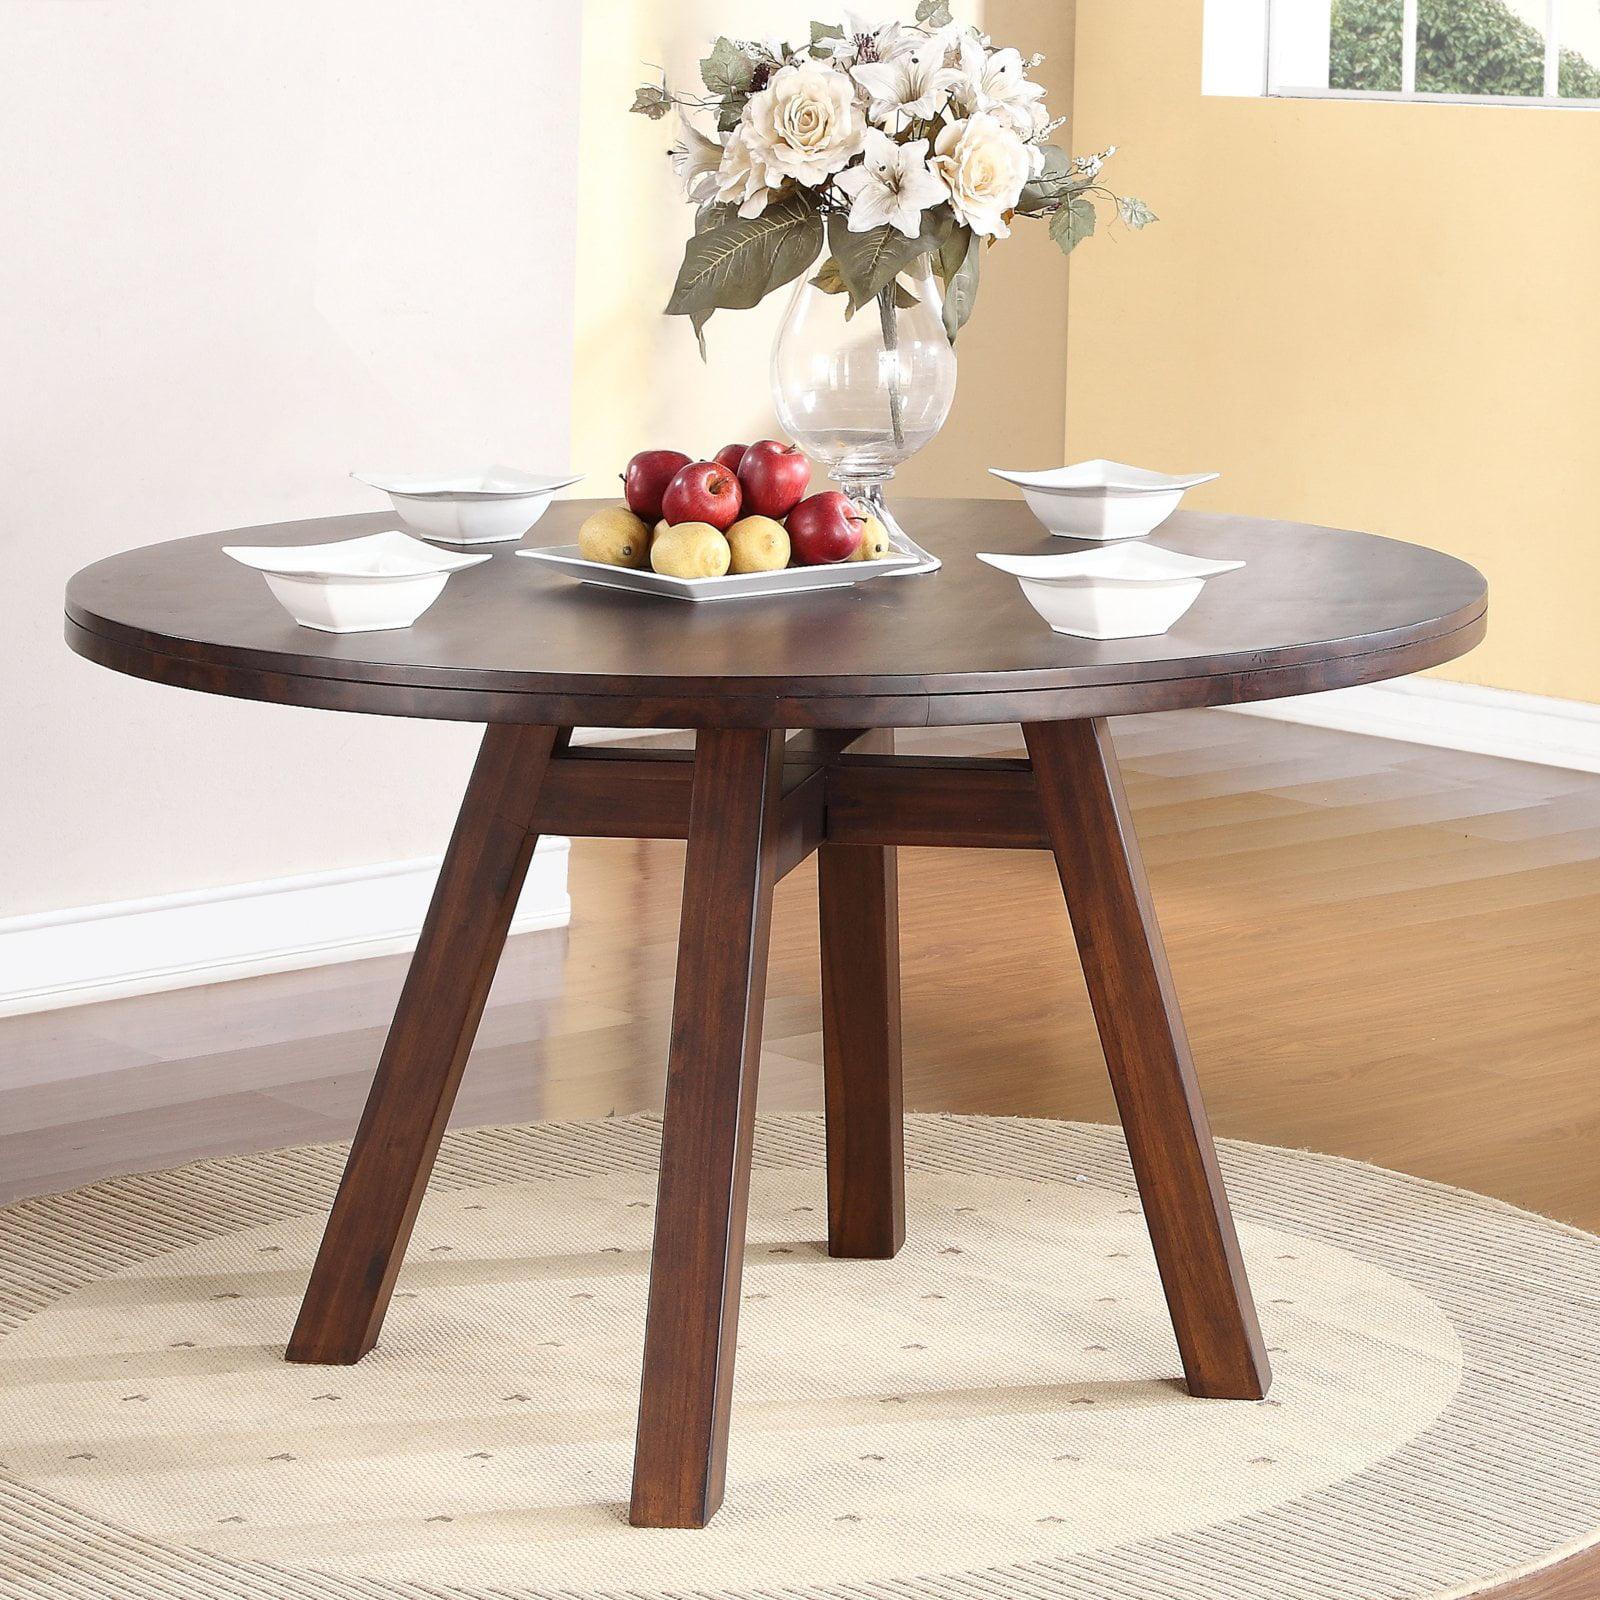 Modus Portland Solid Wood Round Dining Table Medium Walnut by Modus Furniture International